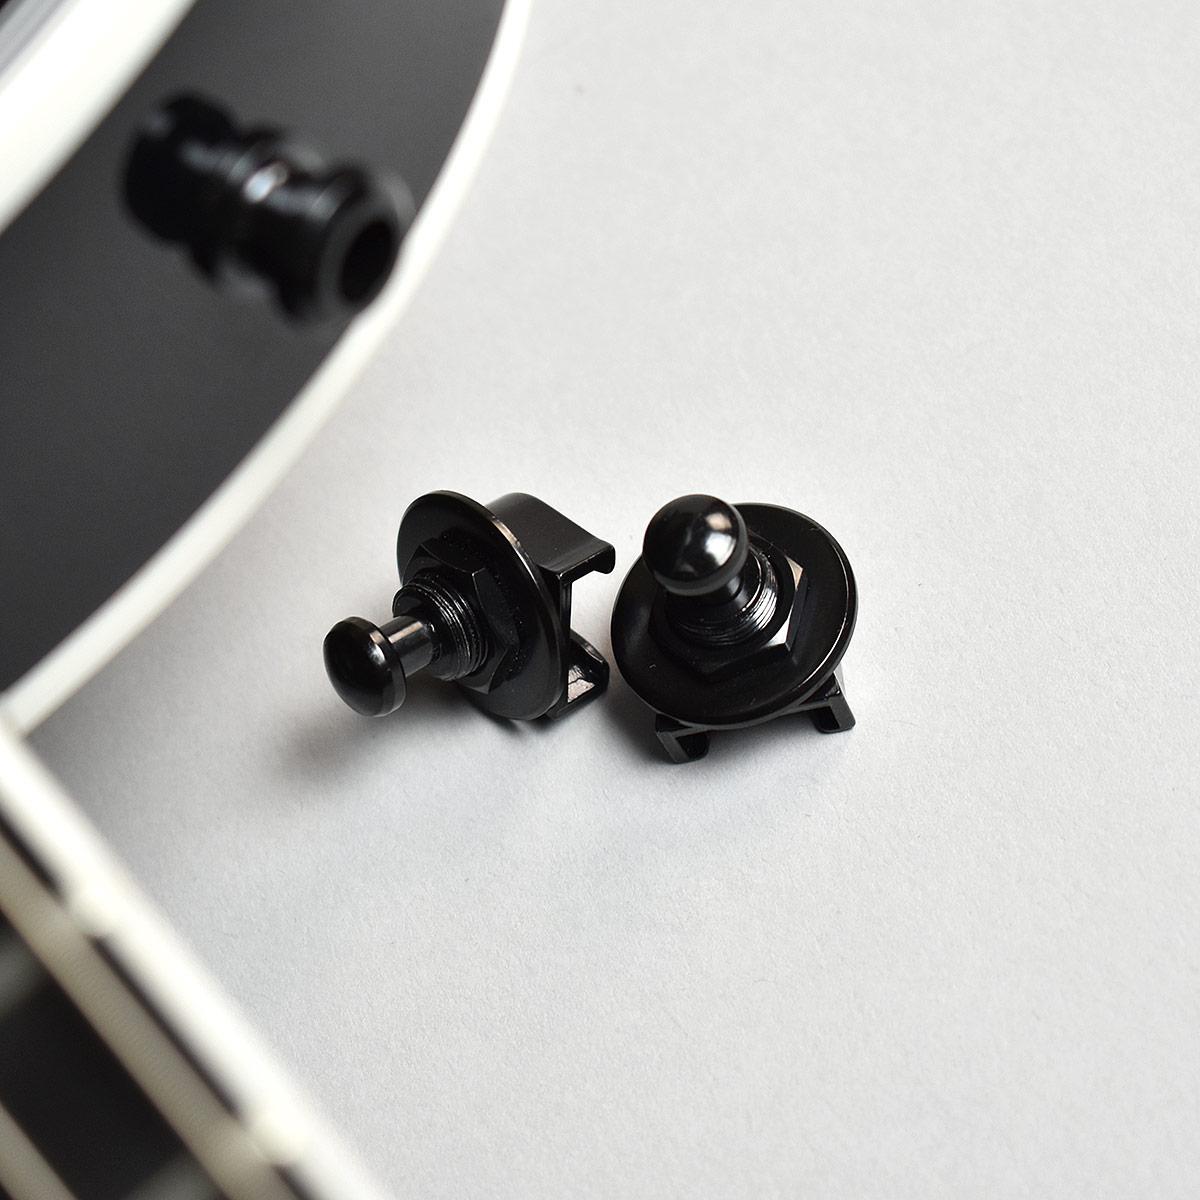 Les Paul Custom Cobla Burst Gloss Black M2M S/N:CS800476【現地選定品】 関連画像